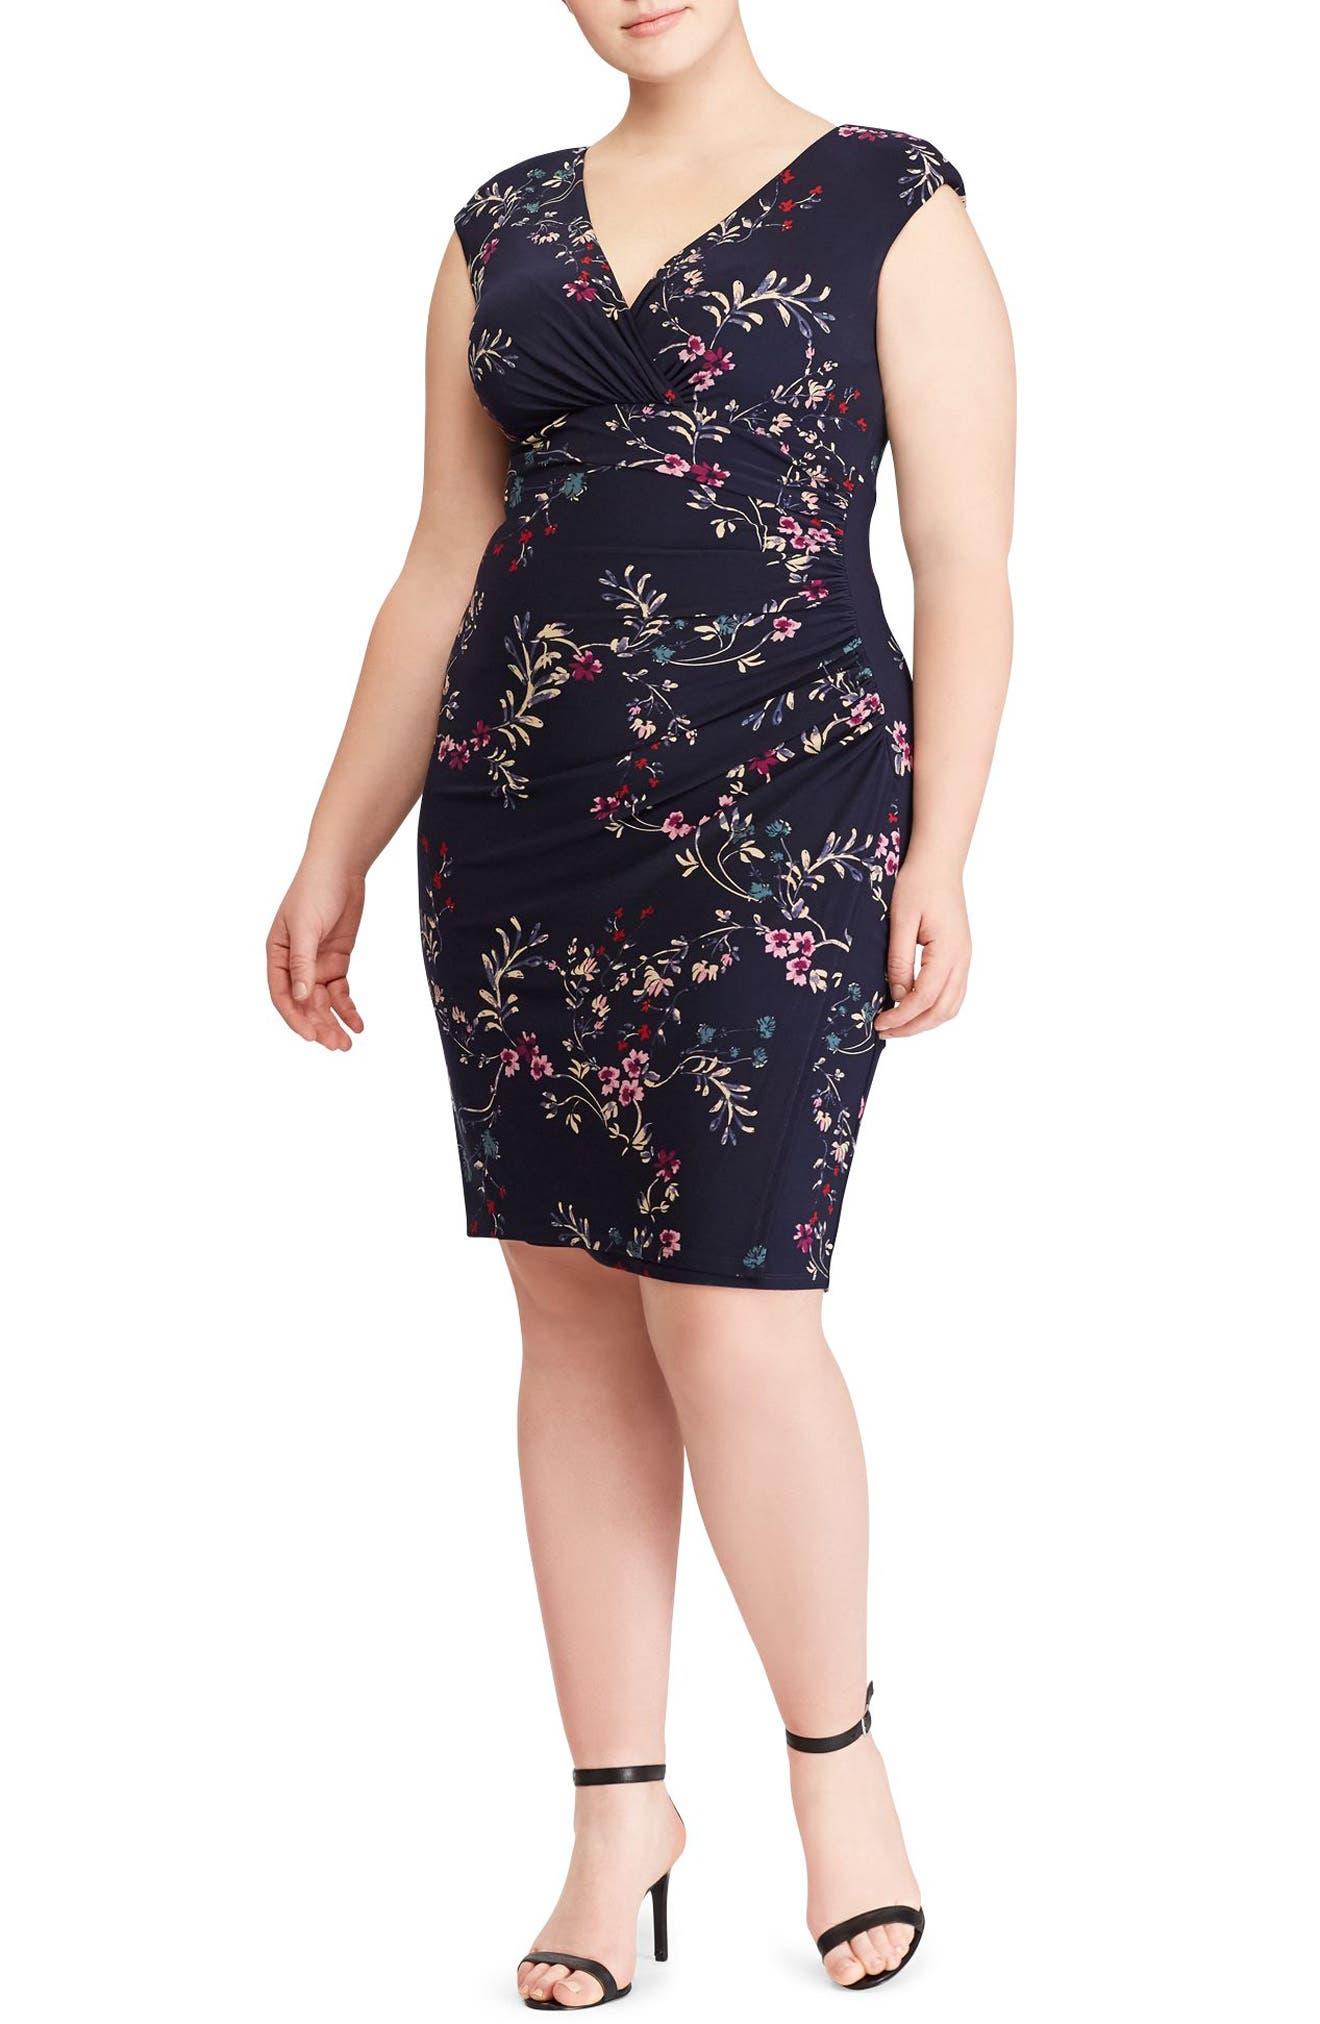 Lauren Ralph Lauren Adara Floral Jersey Dress (Plus Size)